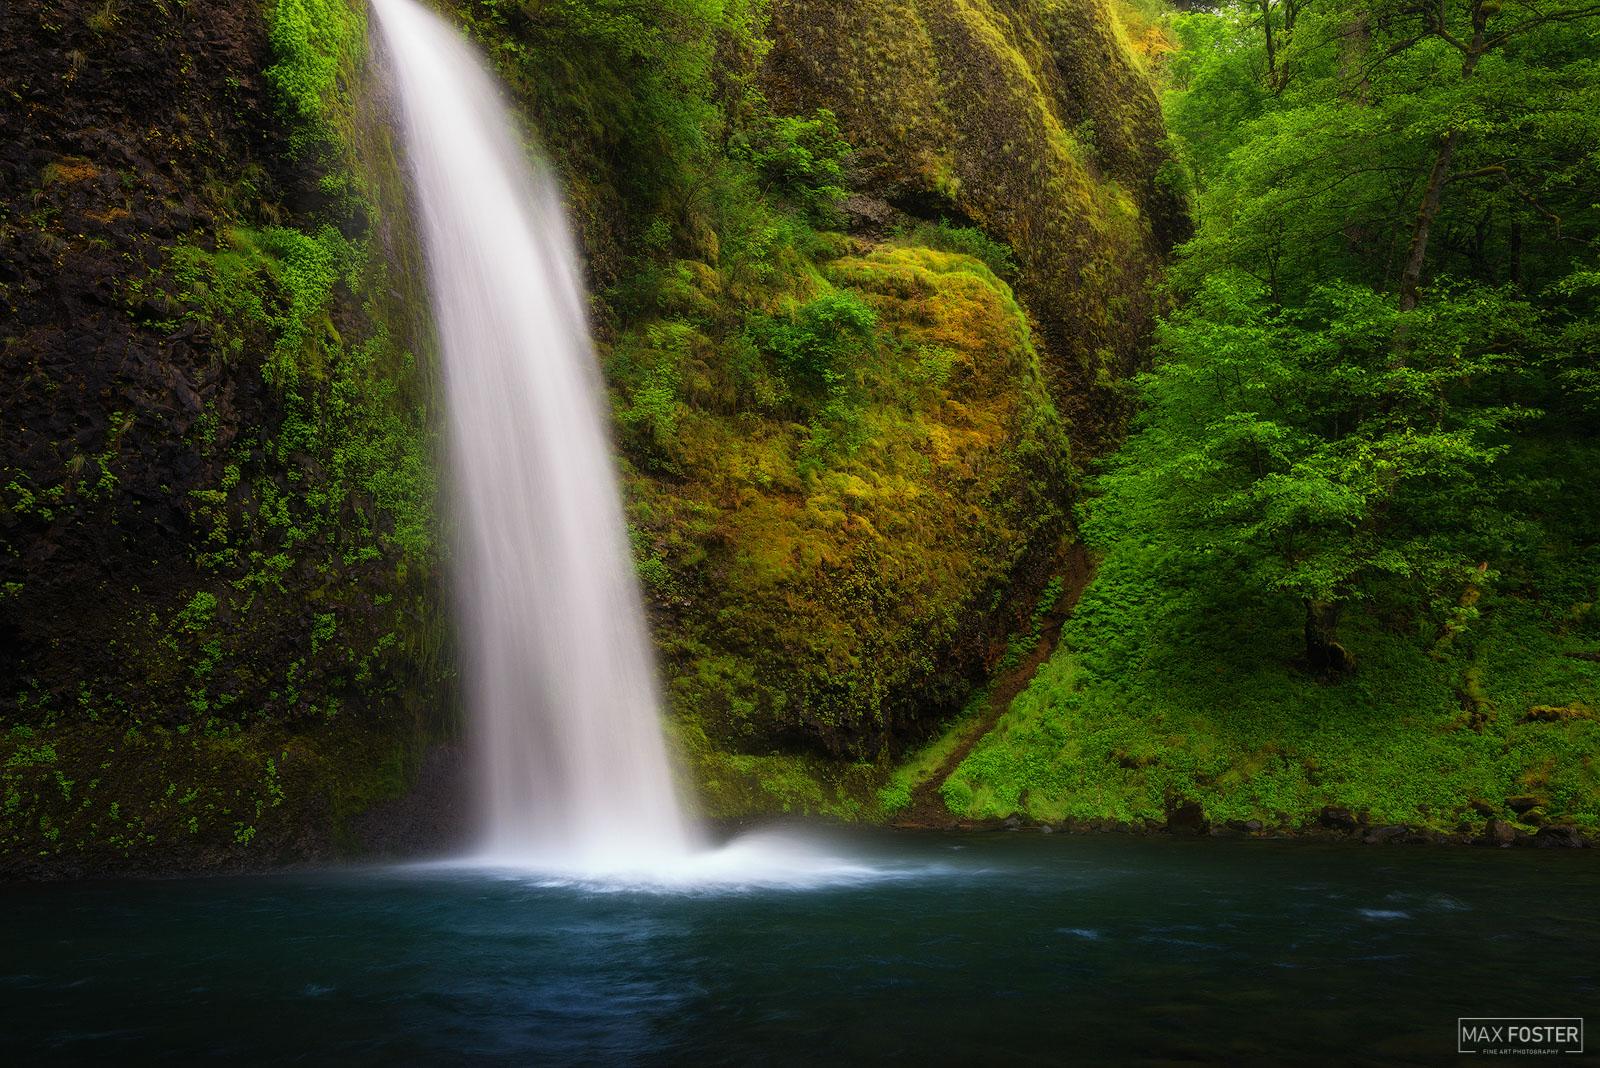 Horsetail Falls, Columbia River Gorge, Oregon, Serenity Now, photo